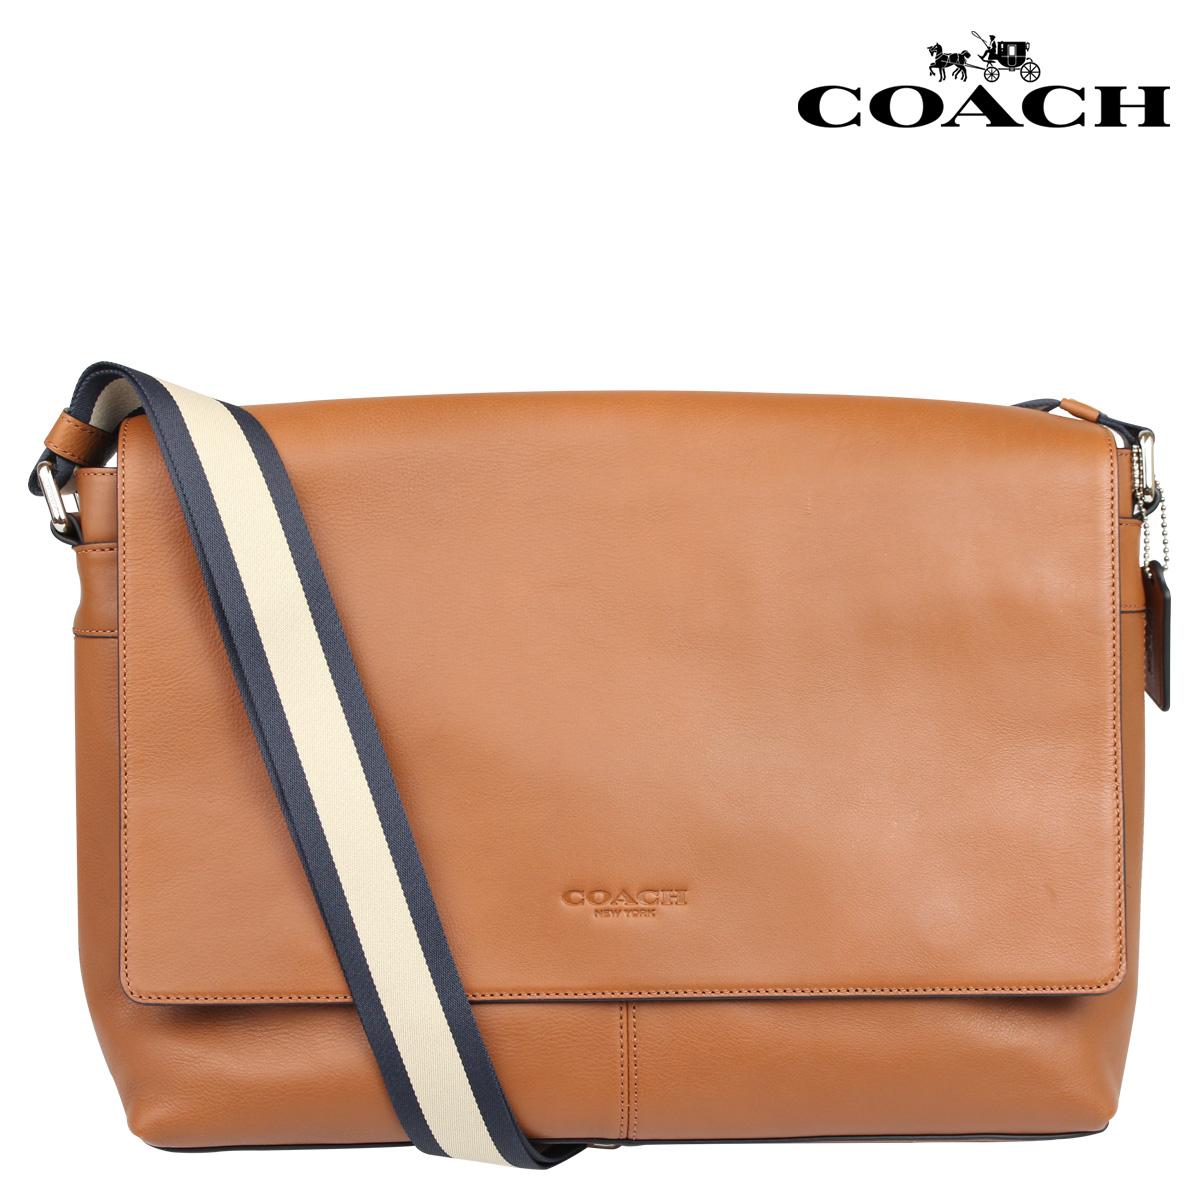 ALLSPORTS | Rakuten Global Market: Coach COACH men's Messenger bag ...